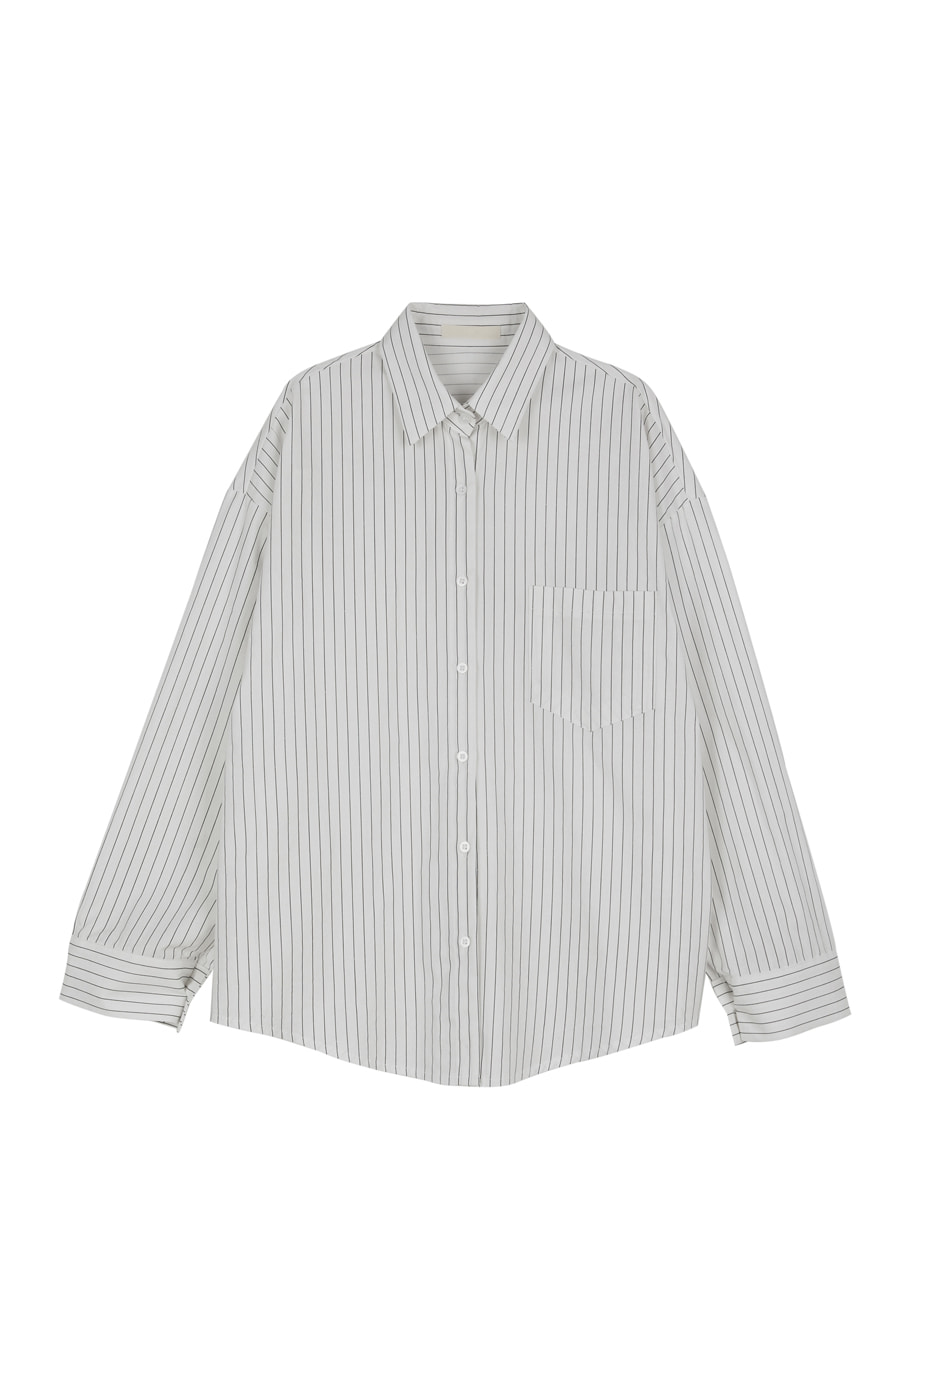 City striped shirt